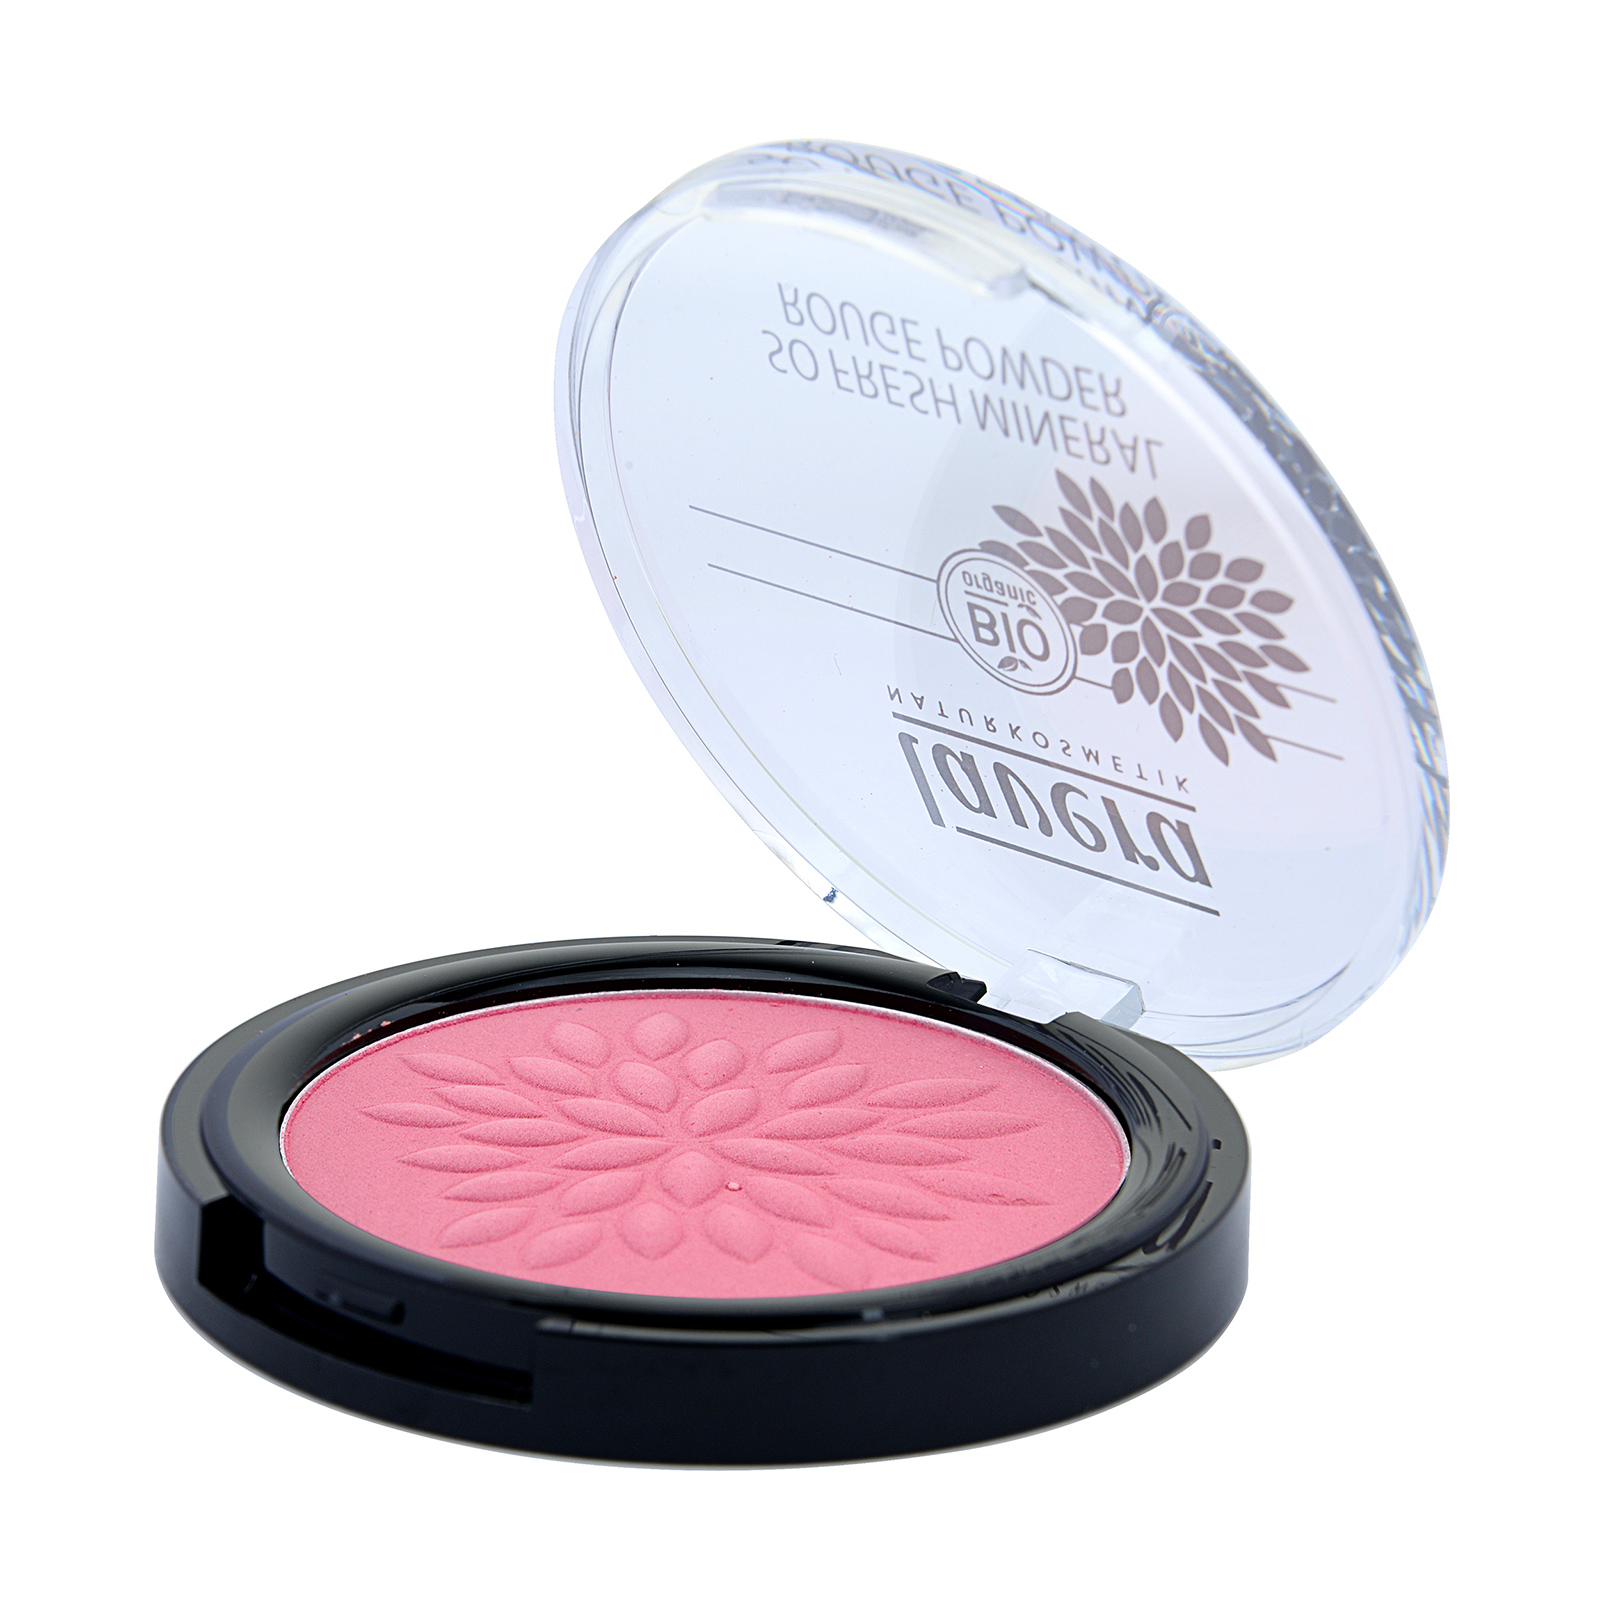 Lavera So Fresh Mineral Rouge Powder 04 Pink Harmony, 0.2oz, 5g